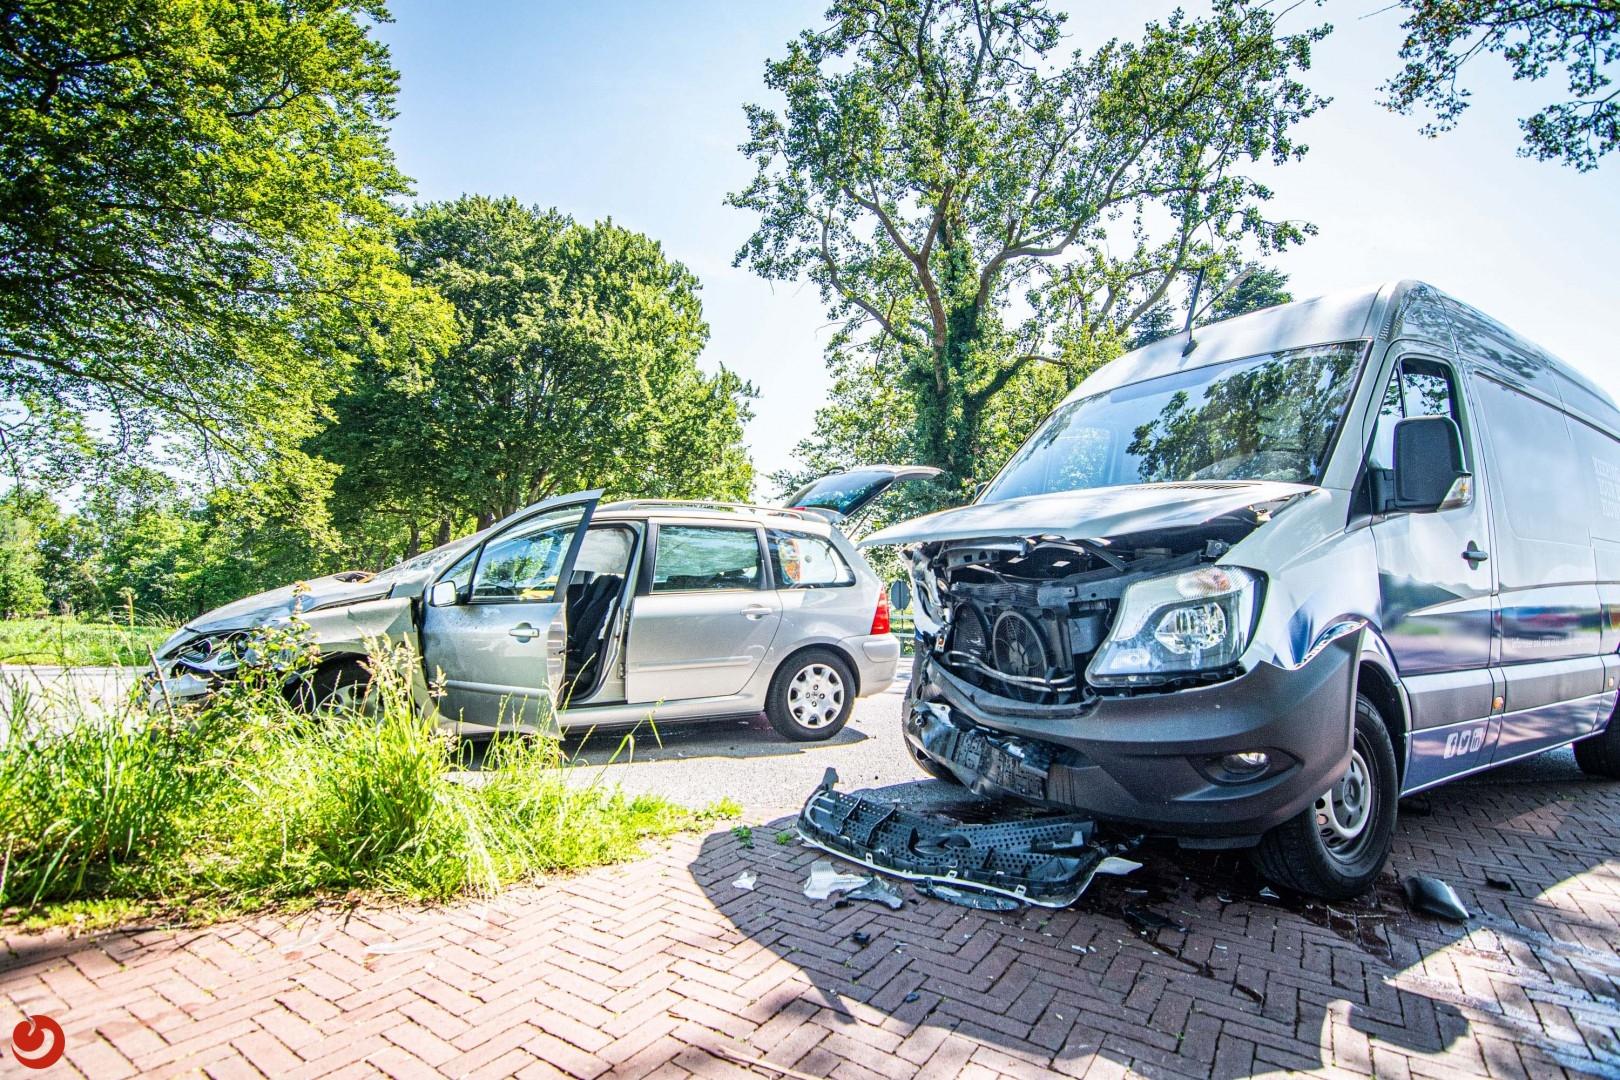 Auto en bestelbus botsen: forse schade